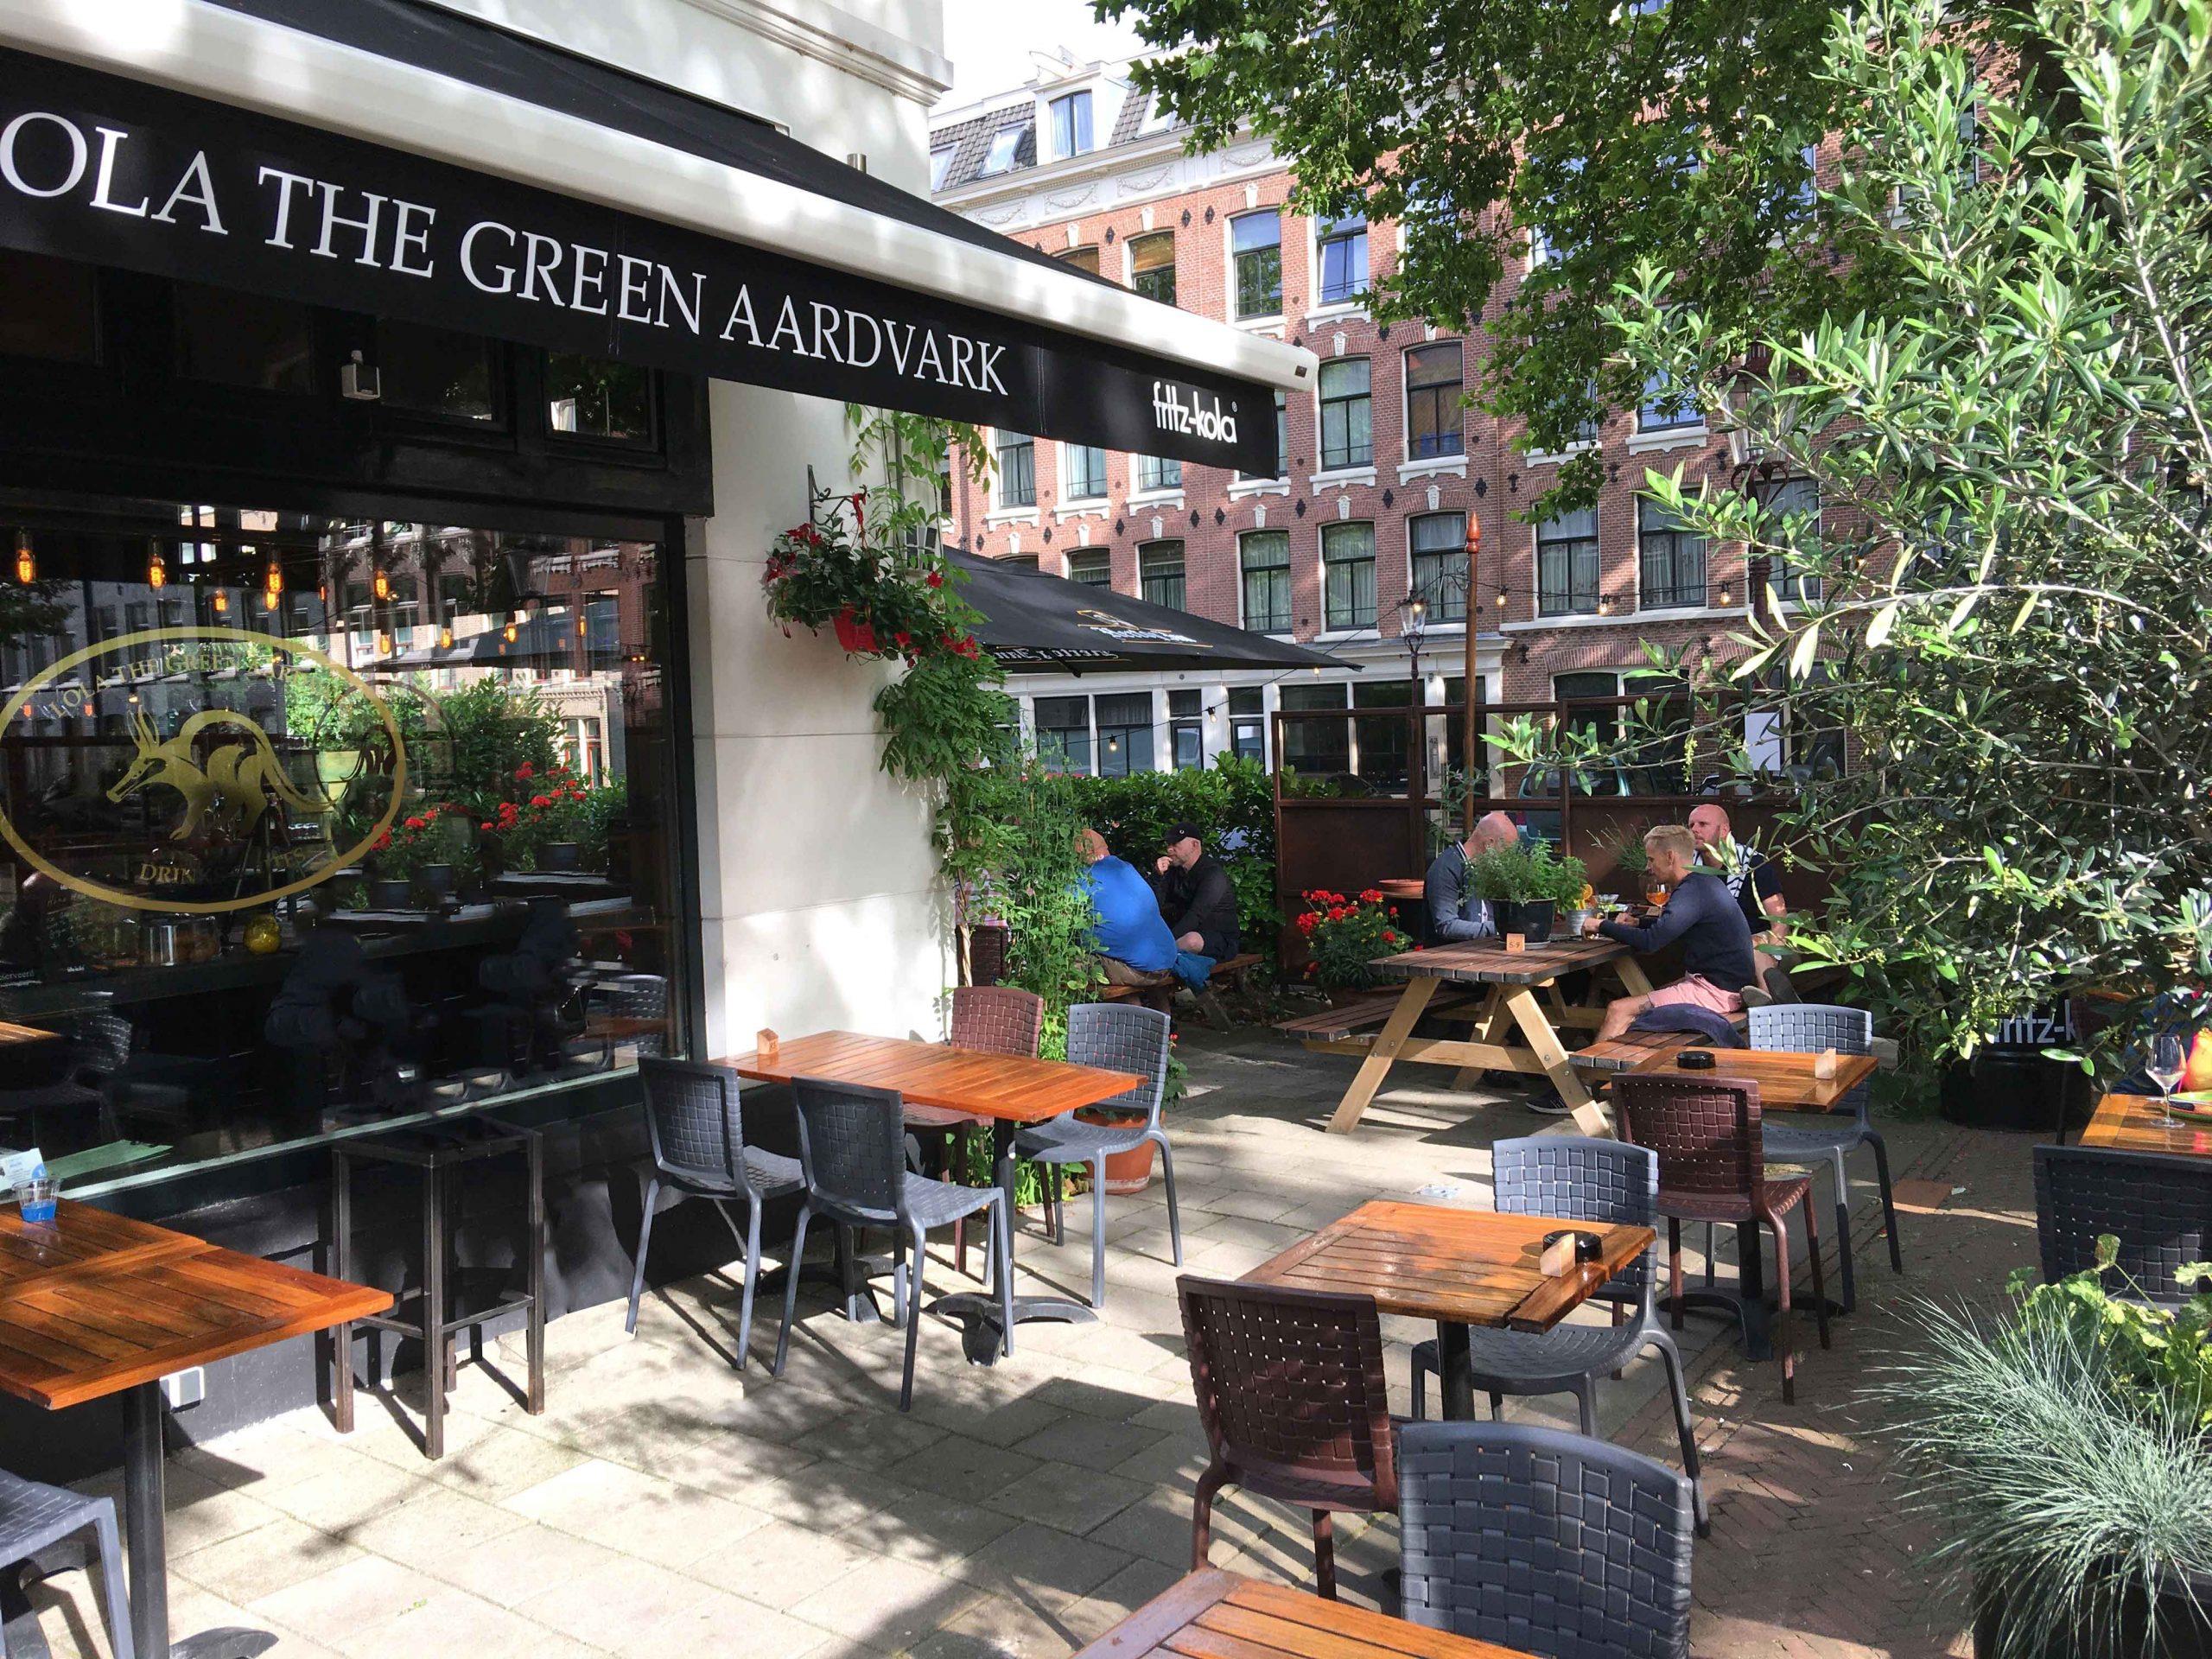 Lola's Magical Garden |  Lola the Green Aardvark